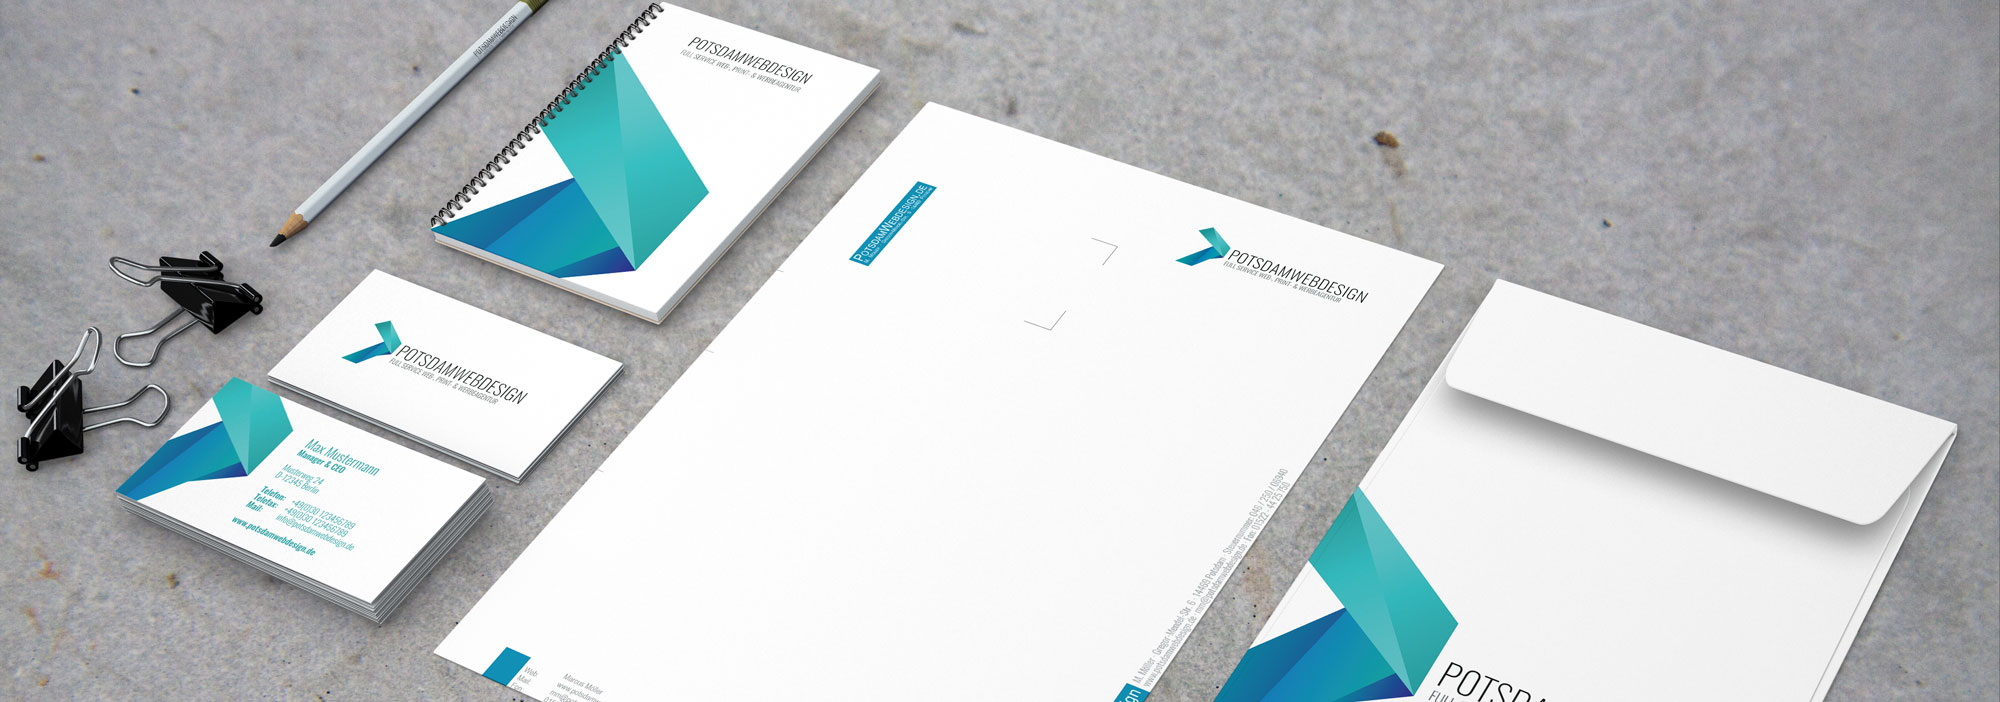 Full Service Web Print Werbeagentur Aus Potsdam